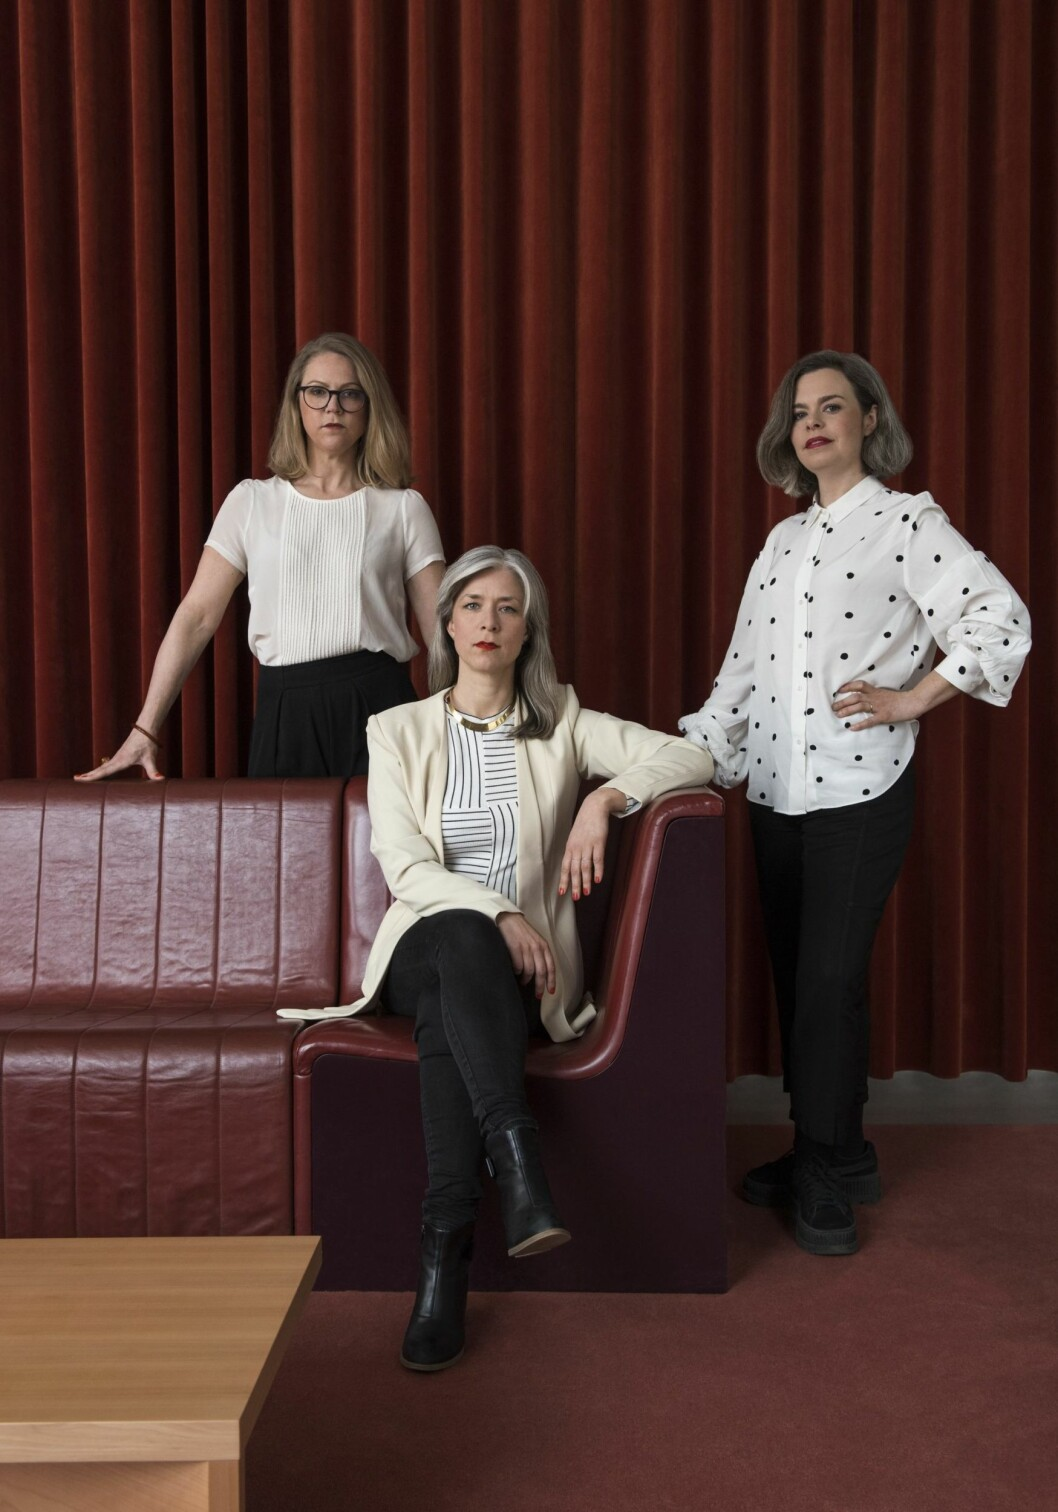 Joyns Helena Eliason, Ida Wanler och Lisa Grape.